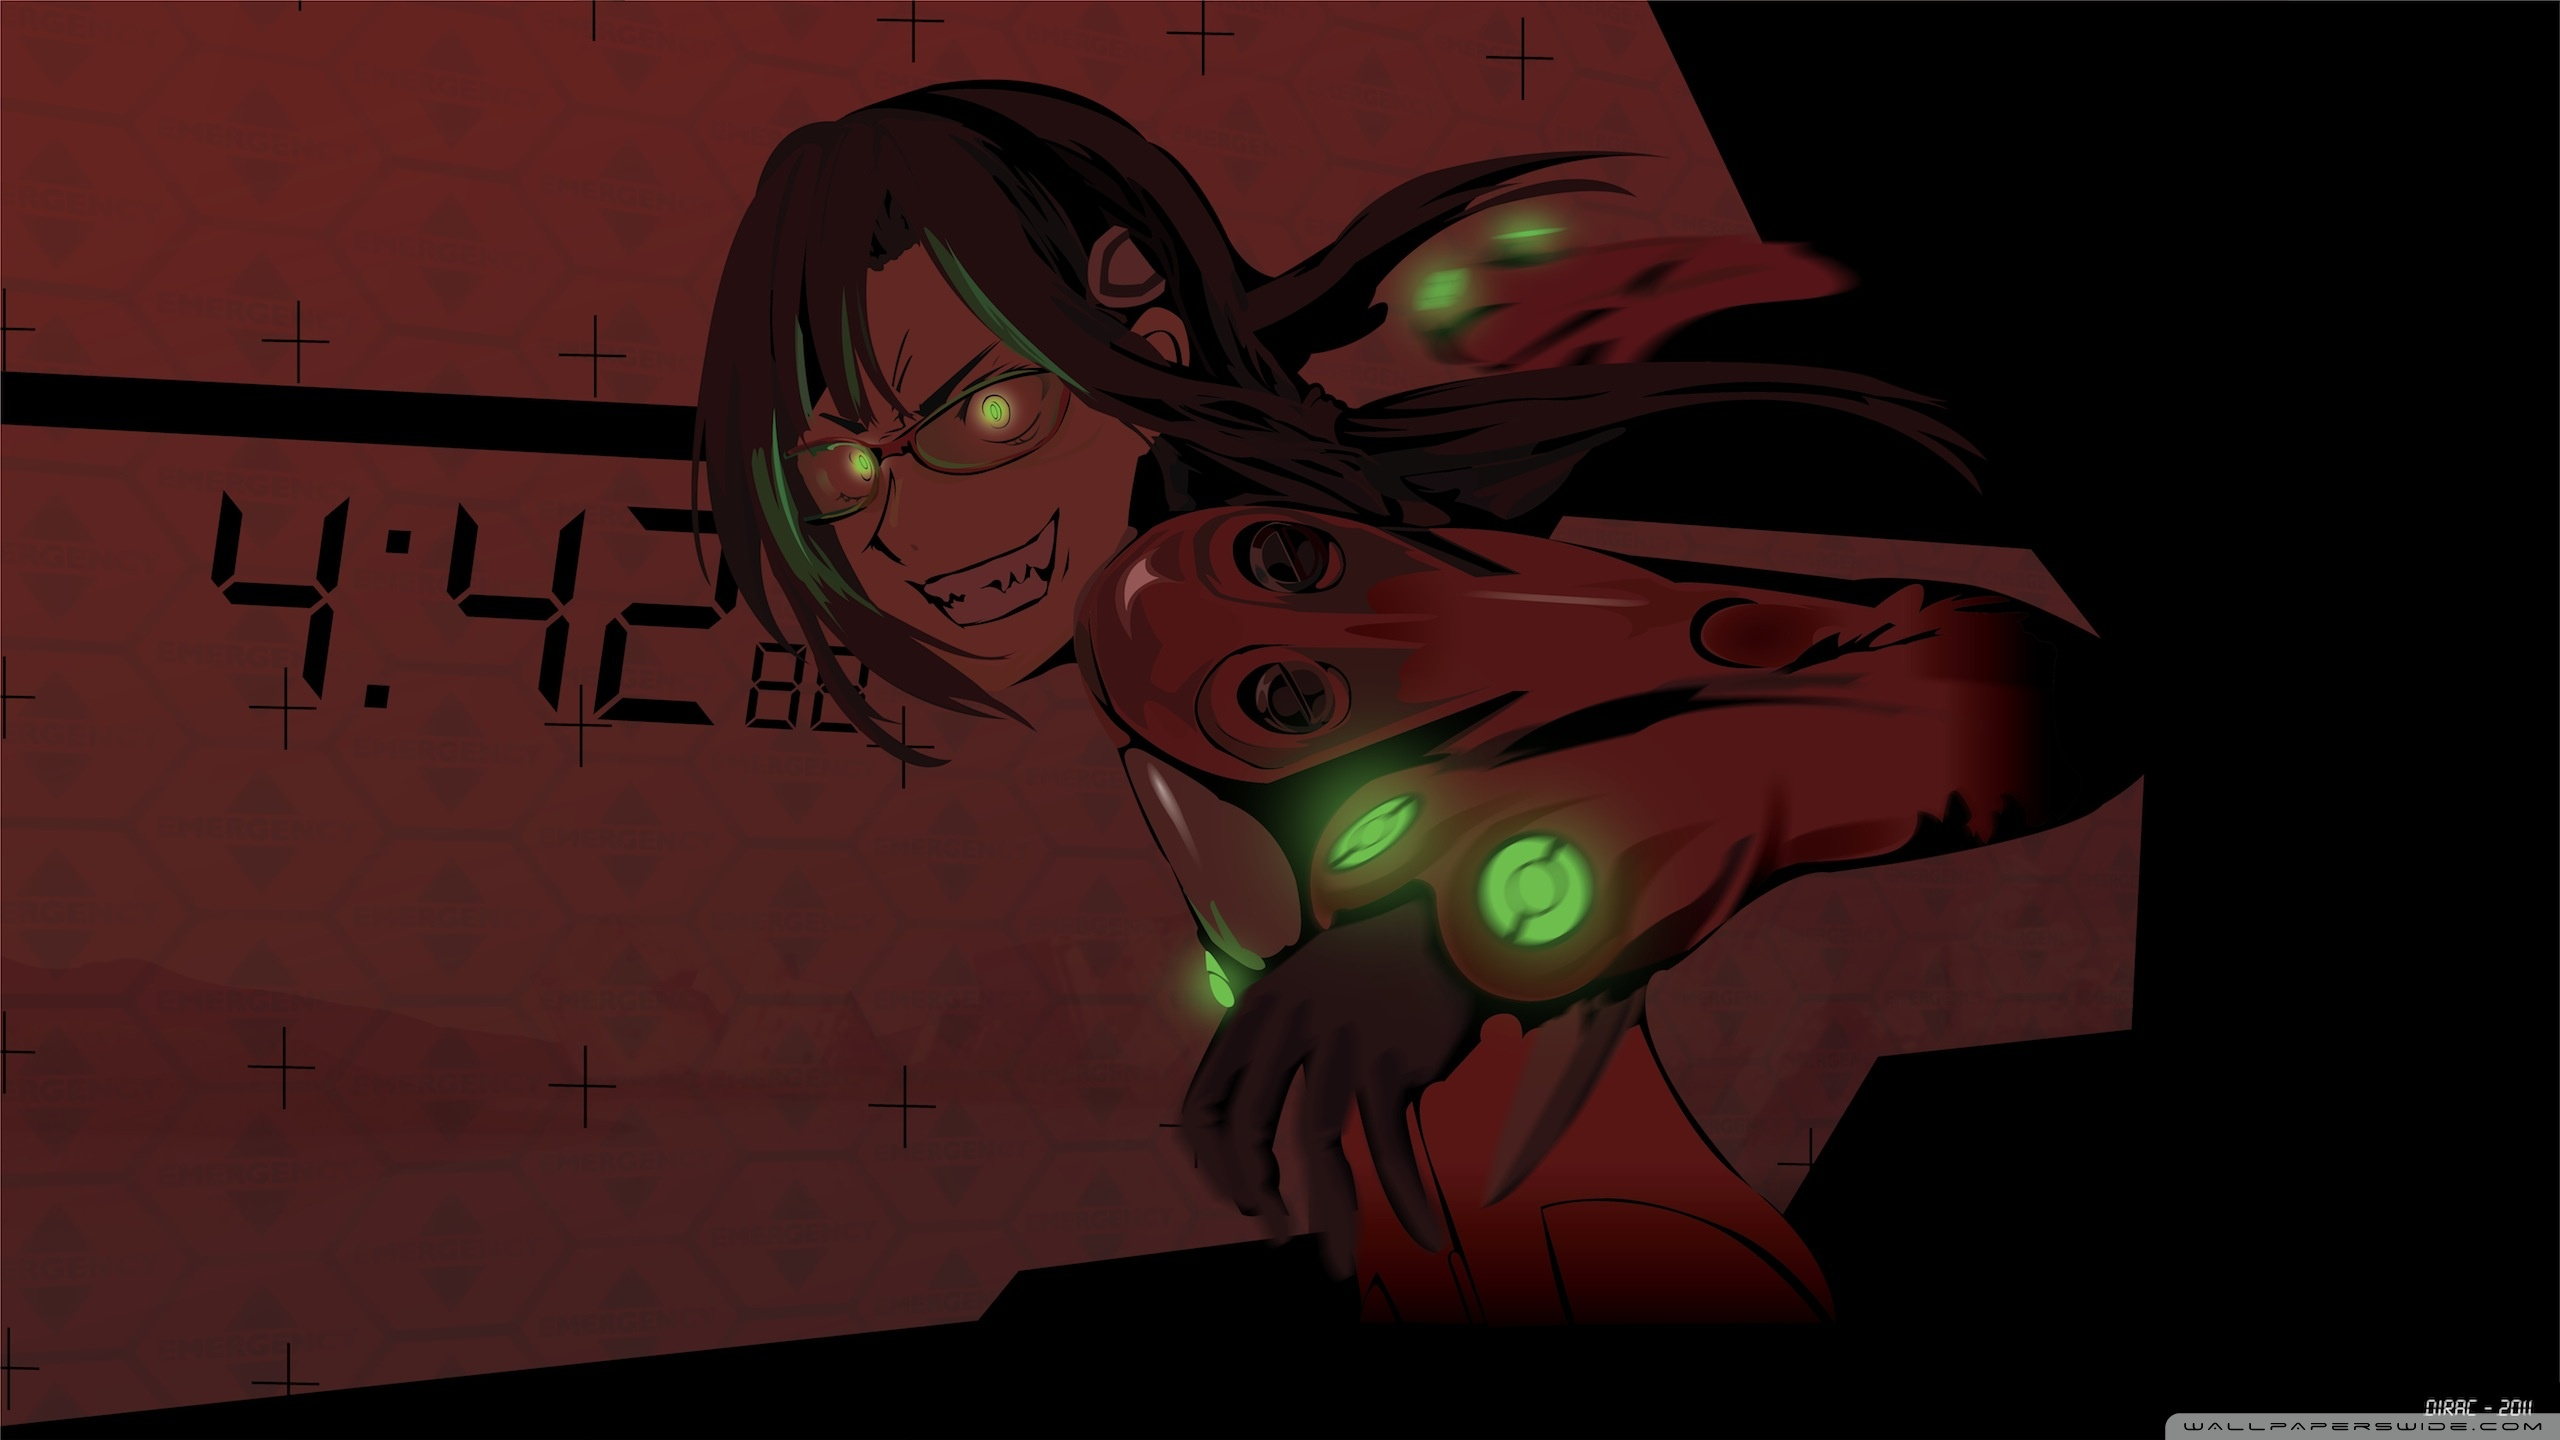 Evil Smile Anime HD desktop wallpaper : Widescreen : High